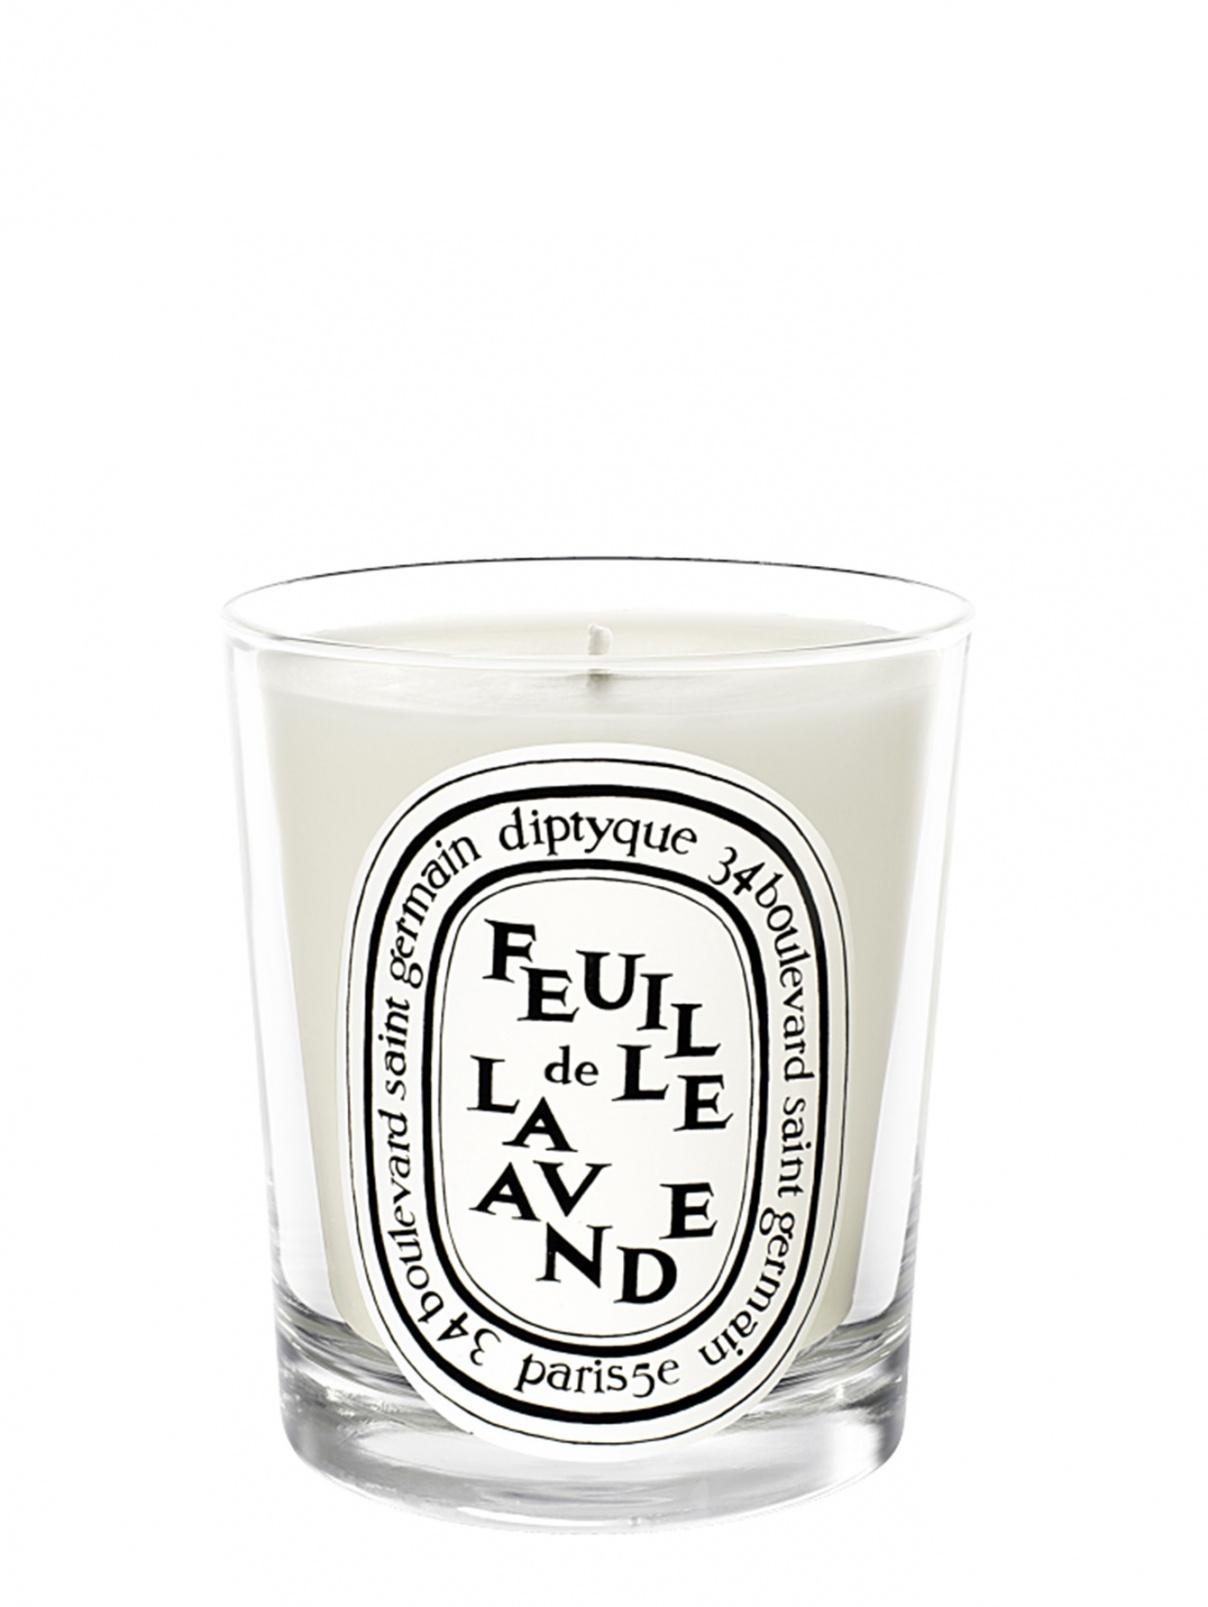 Feuille De Lavande Свеча, 70 г Diptyque  –  Общий вид